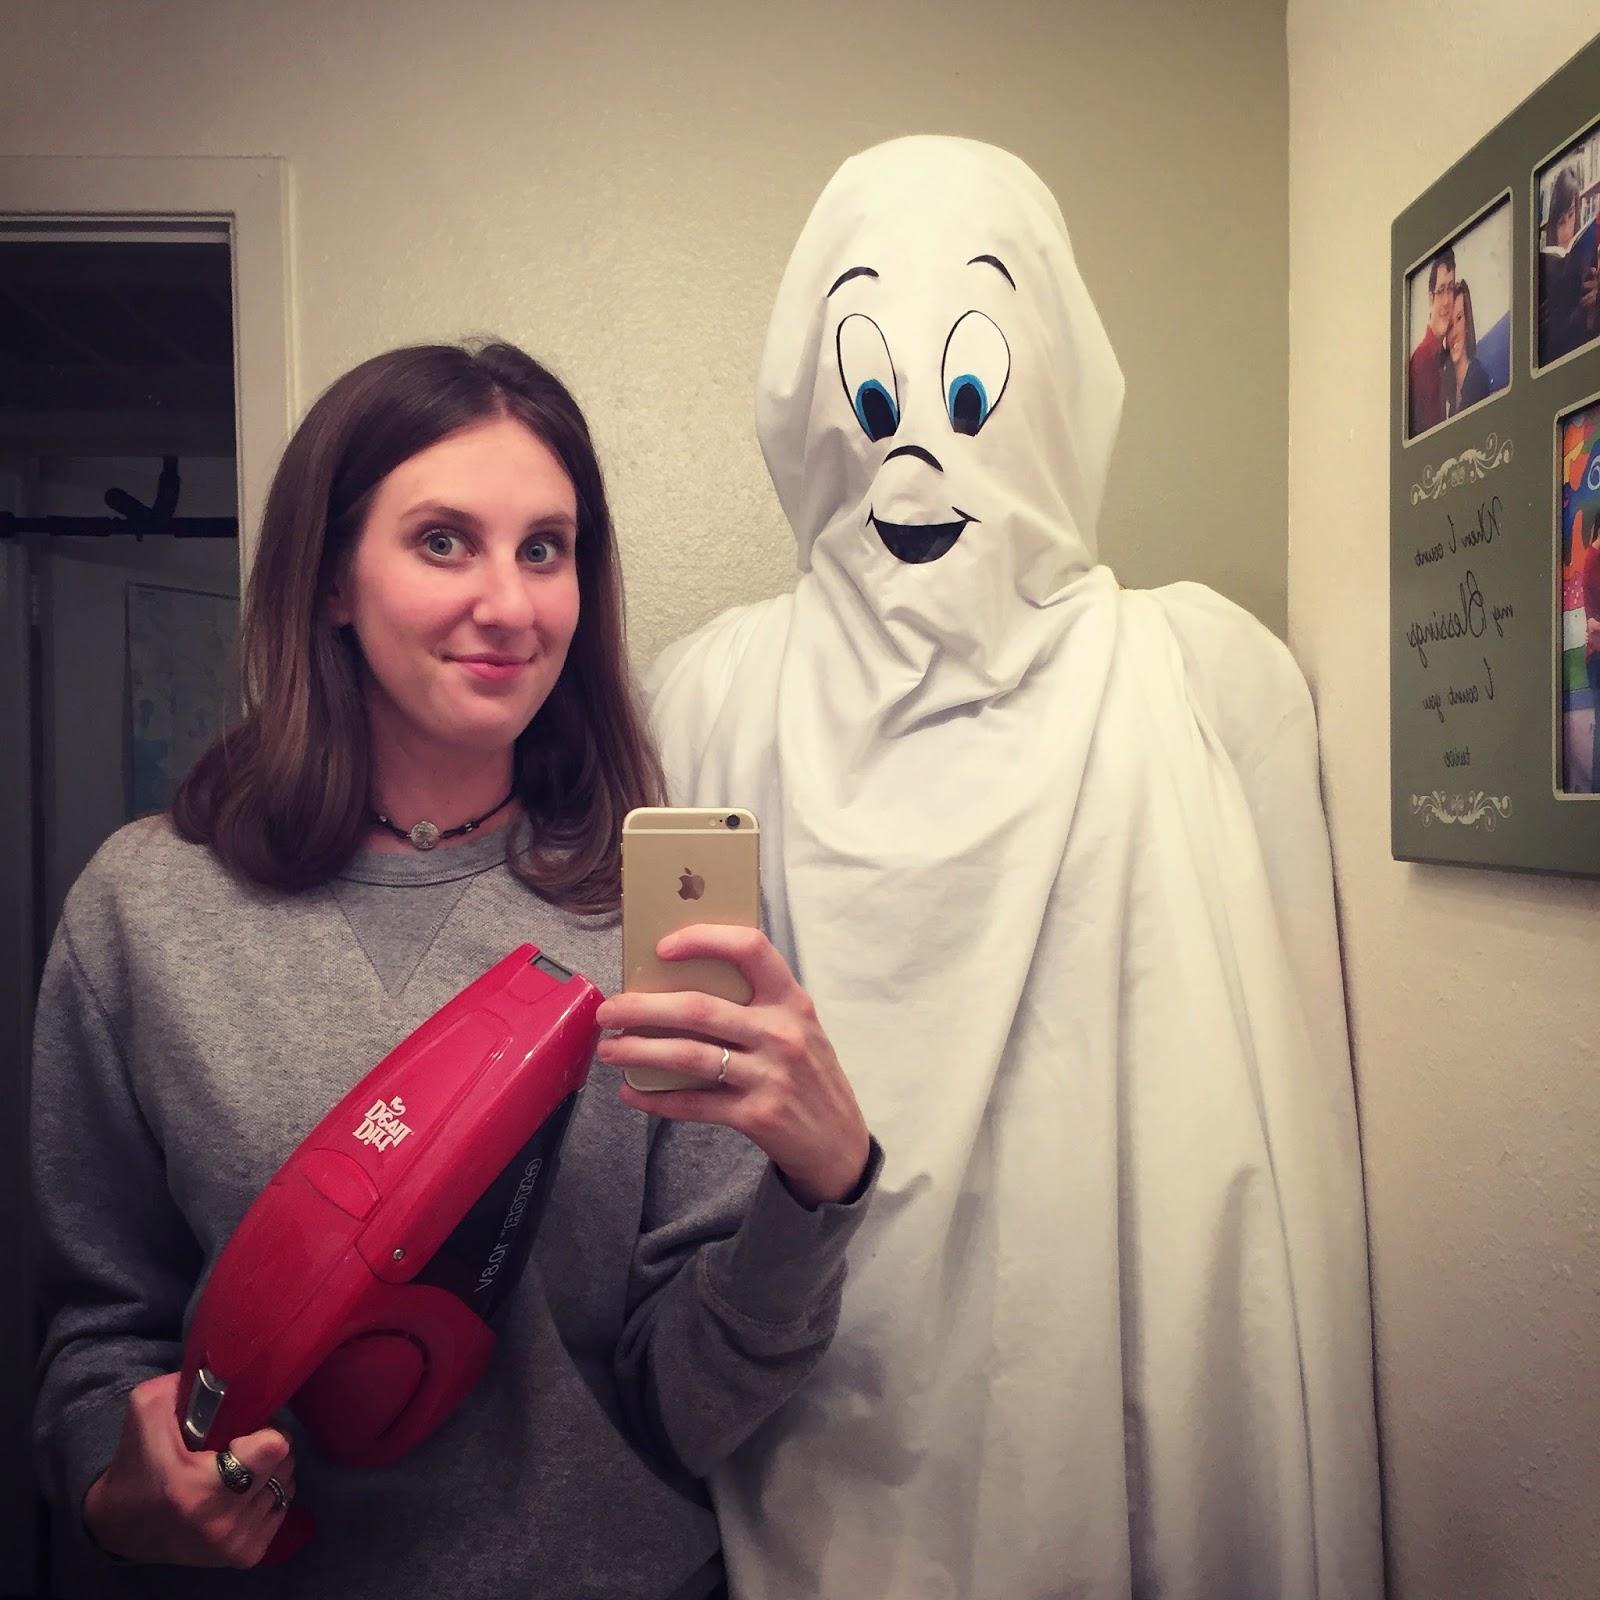 casper and wendy costume. sunday, november 2, 2014 casper and wendy costume g